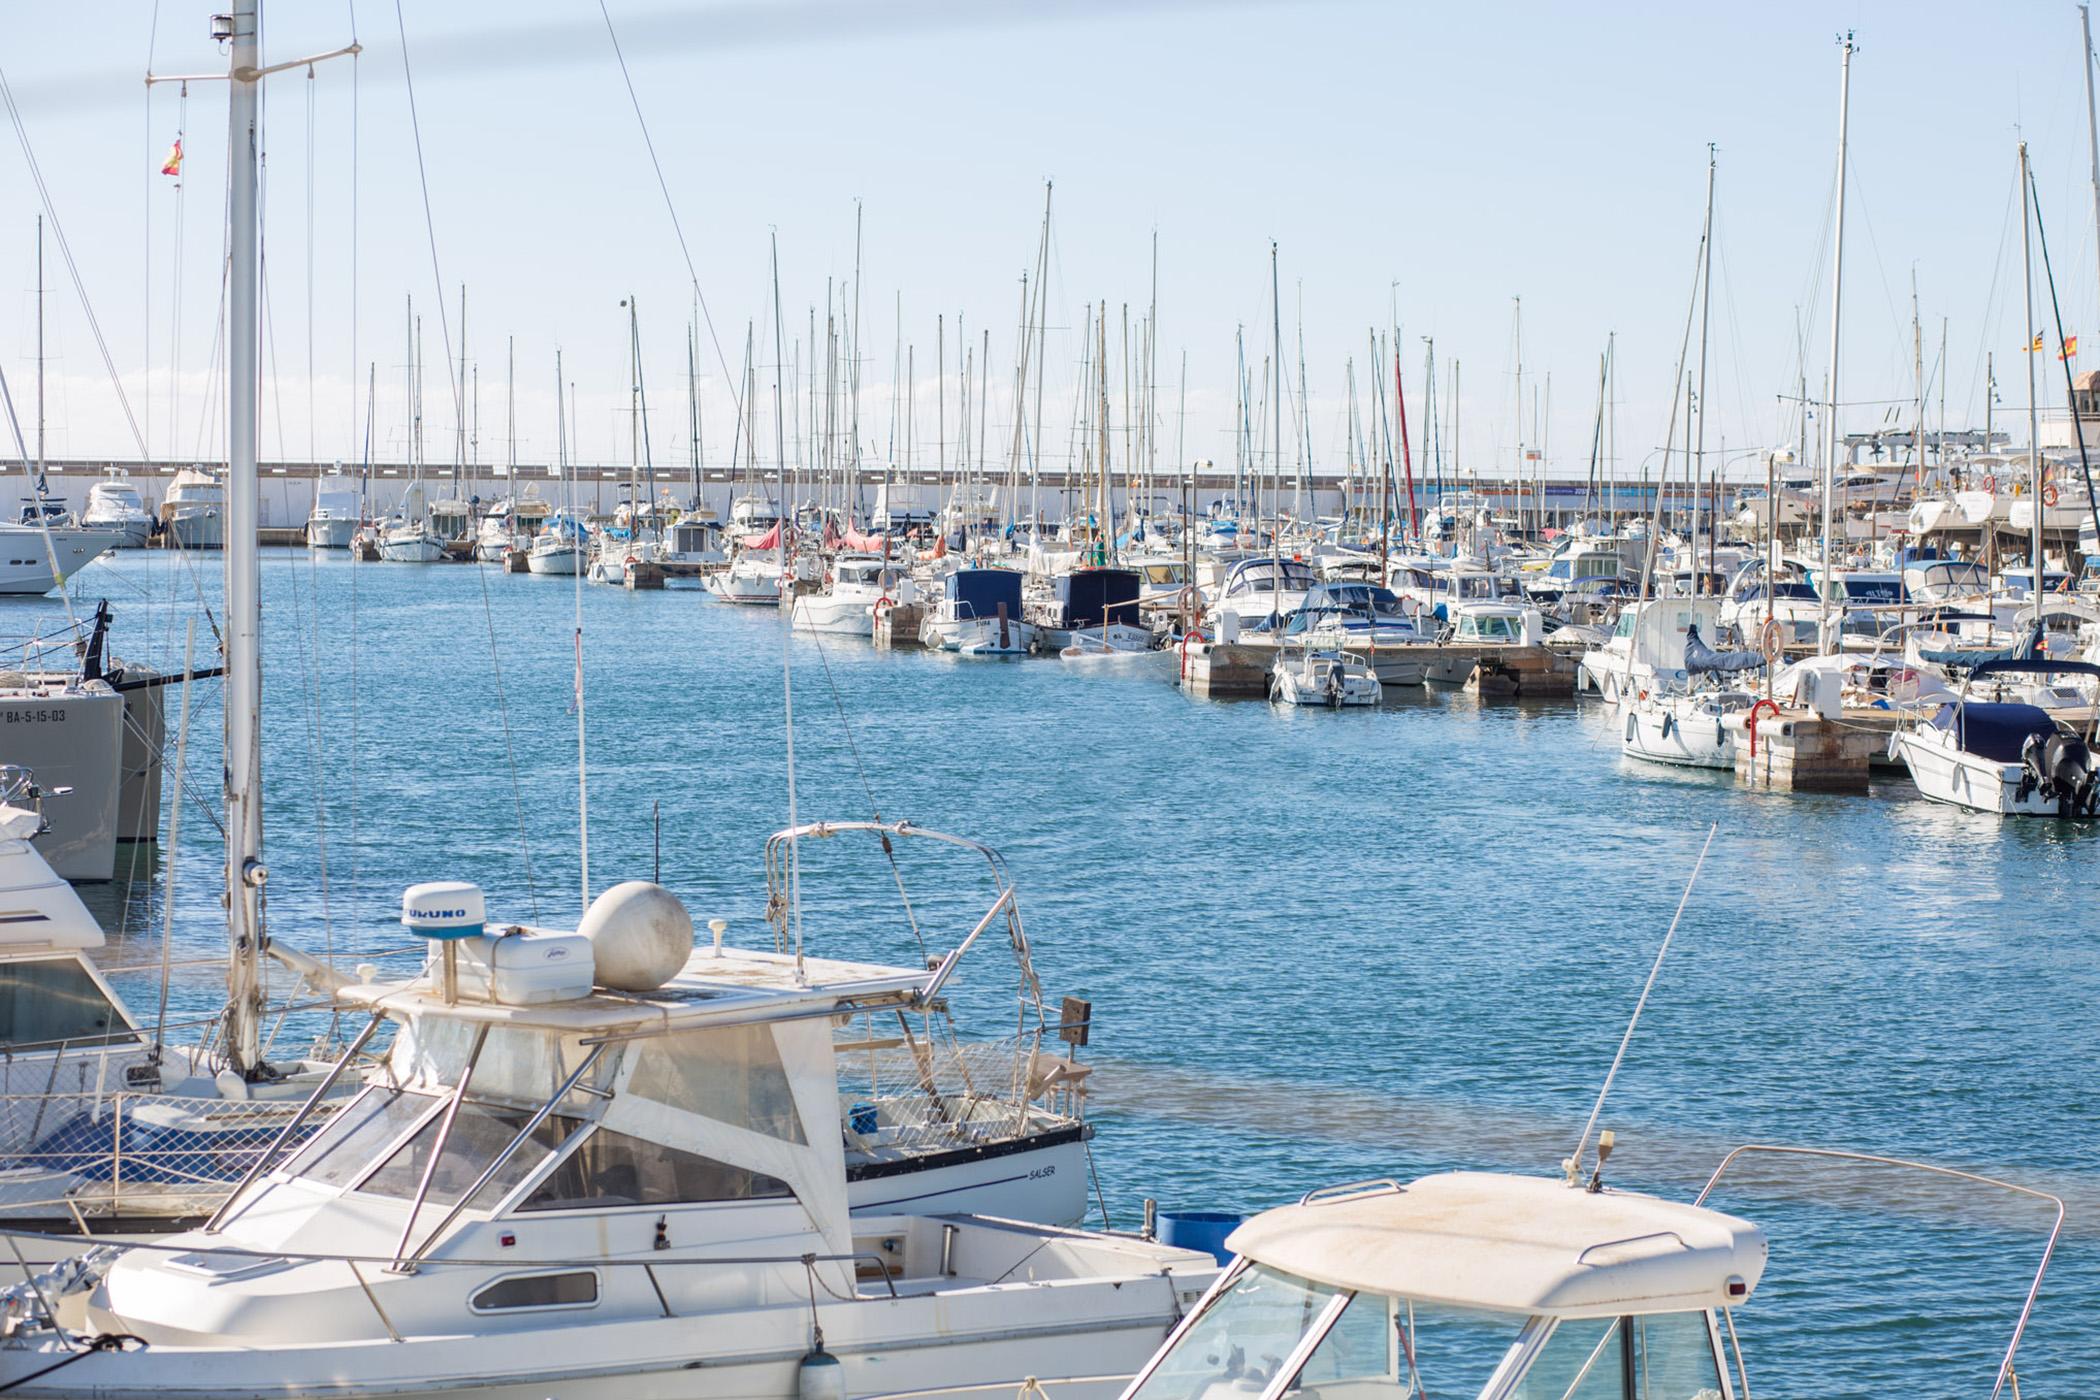 Ferienhaus SANT BLAI VELL (2284789), Campos, Mallorca, Balearische Inseln, Spanien, Bild 28